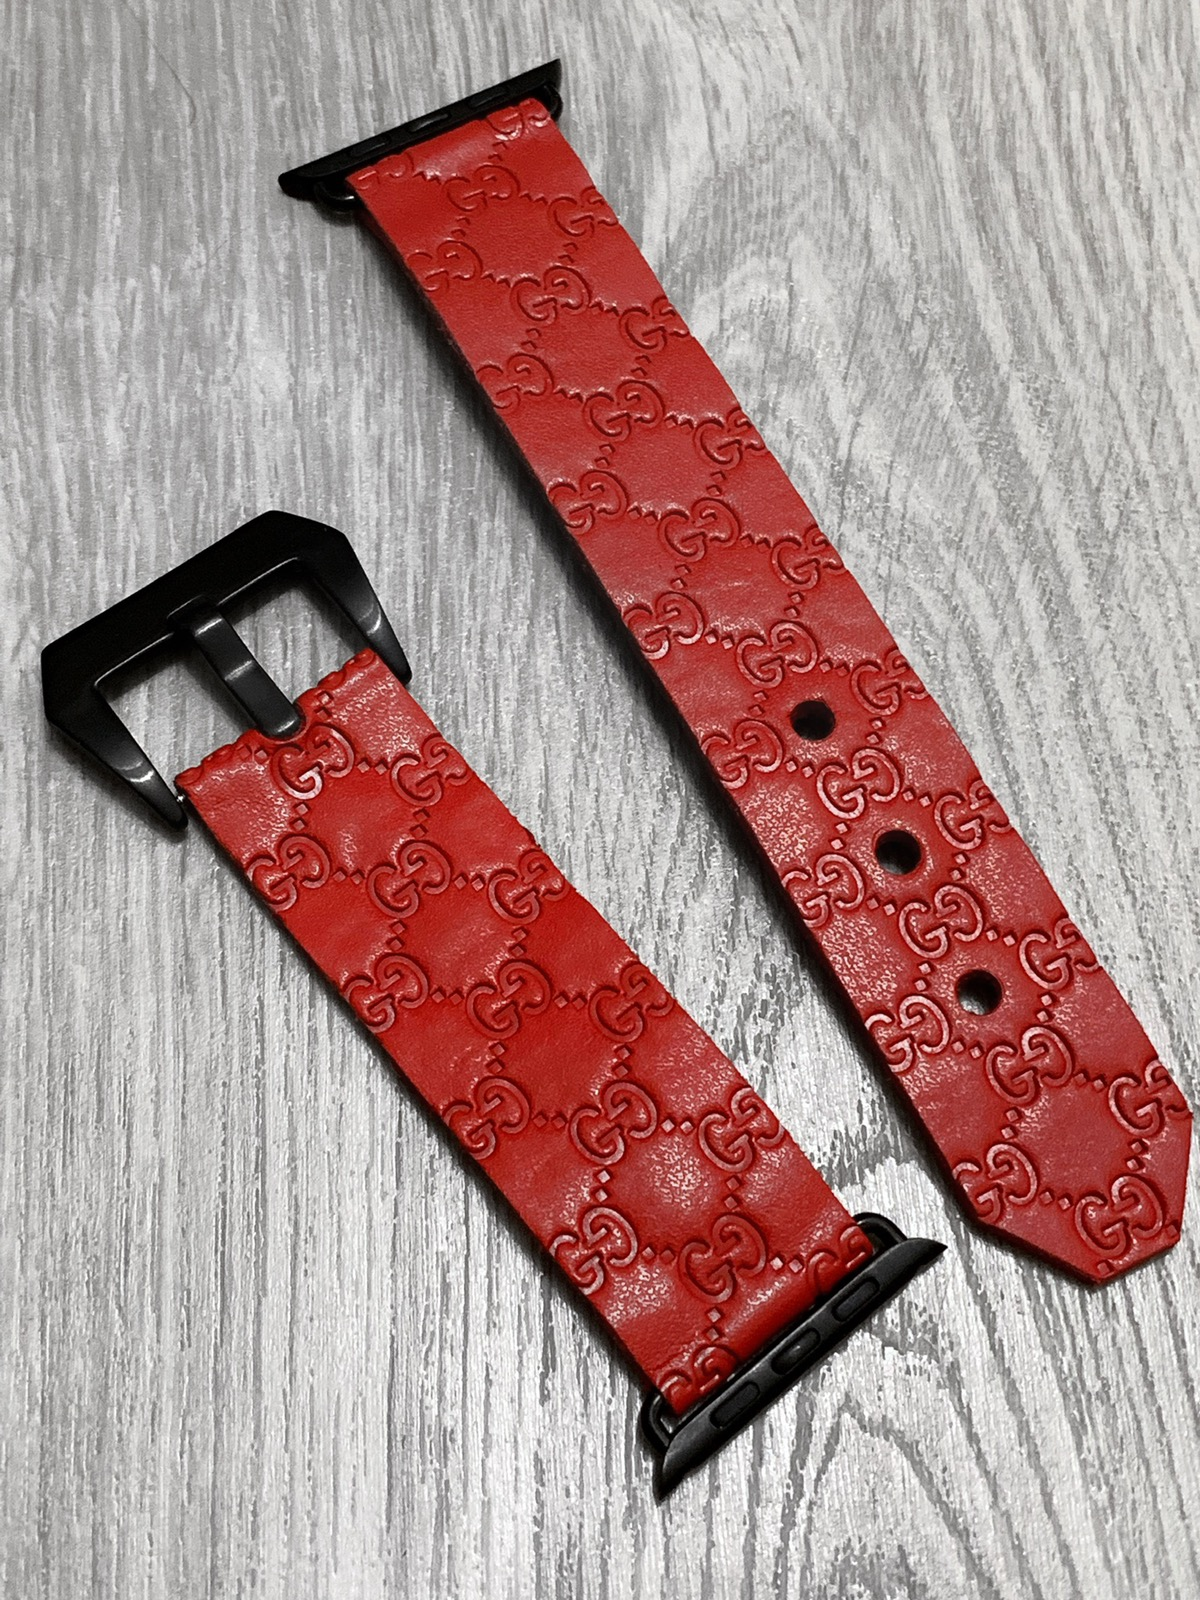 online retailer 866d5 7ff10 Gucci Apple Watch Watchband Stripe Belt iPhone X 10 Case Handmade Custom  Made From Vintage Monogram Bag